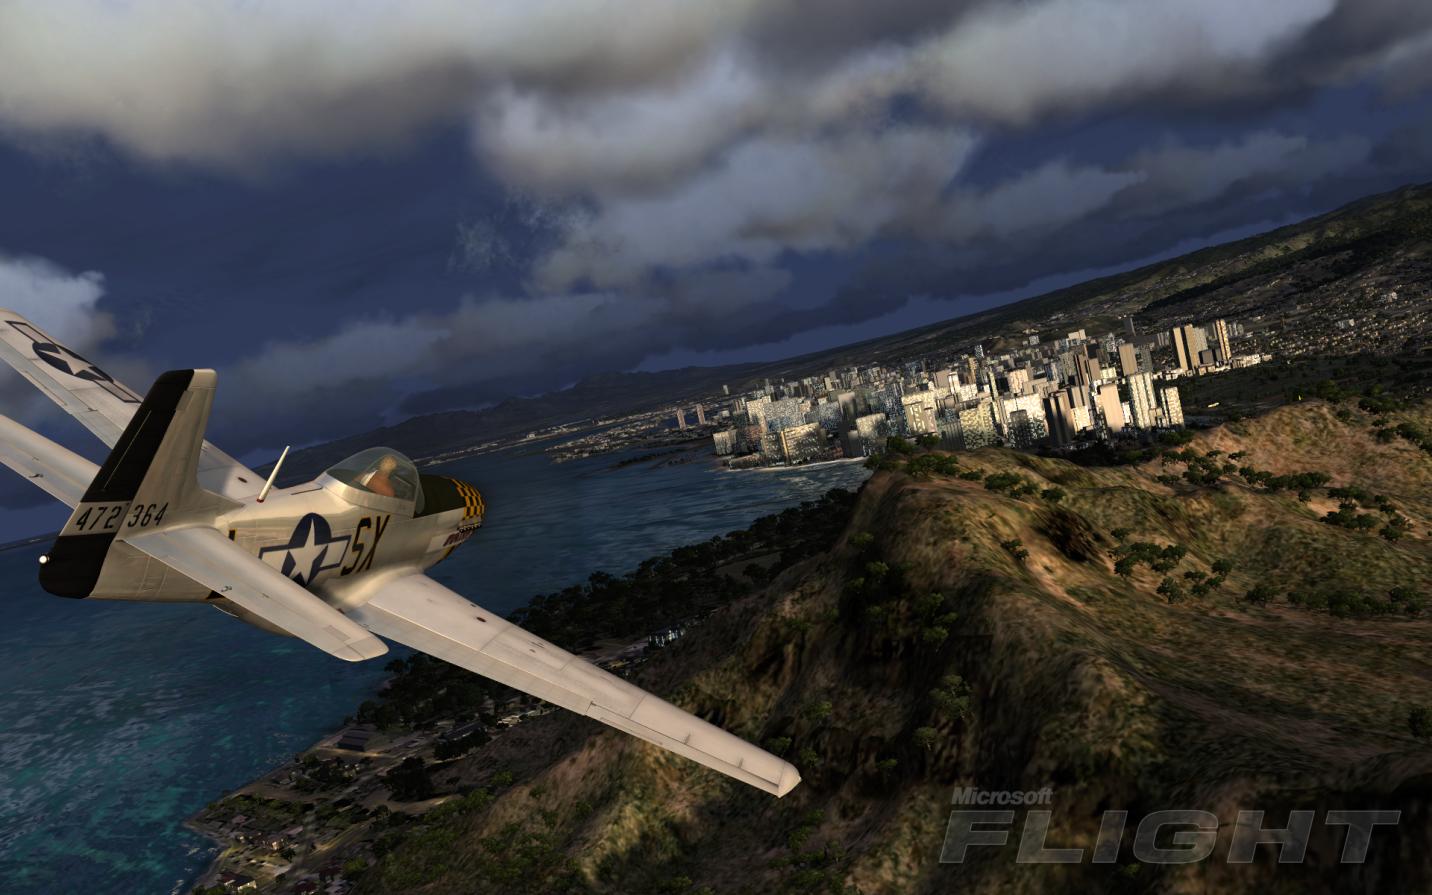 Microsoft Flight - the next sim, err, game from MS